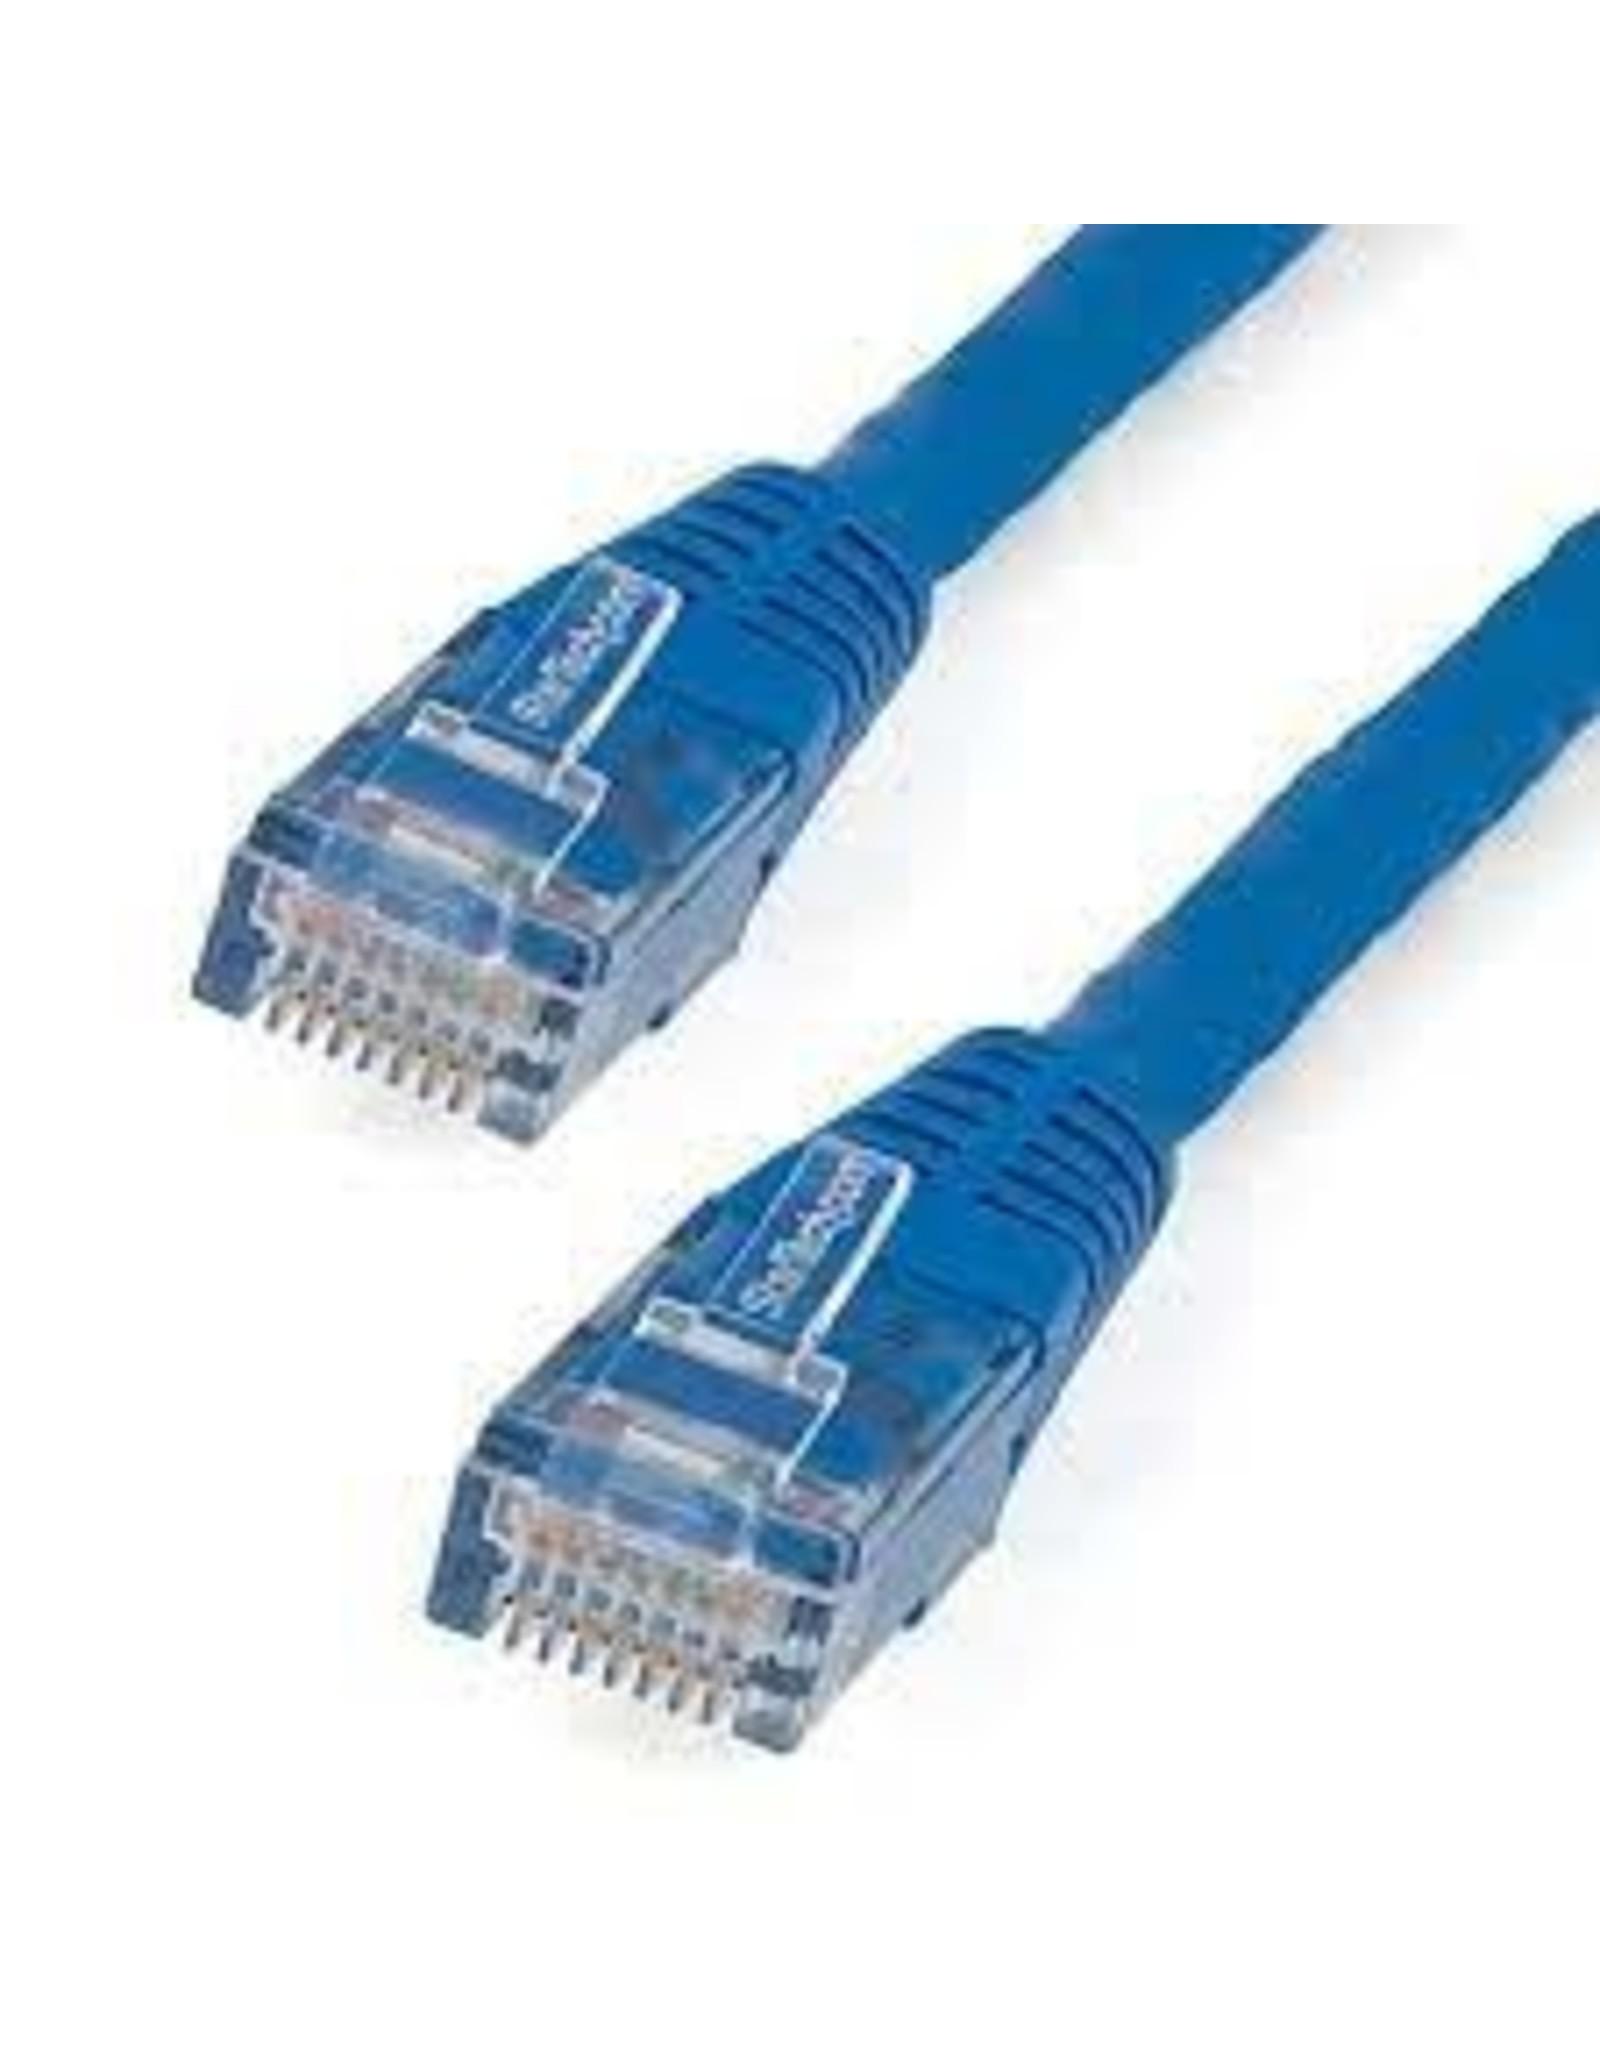 Startech 15FT CAT6 ETHERNET CABLE BLUE CAT 6 POE